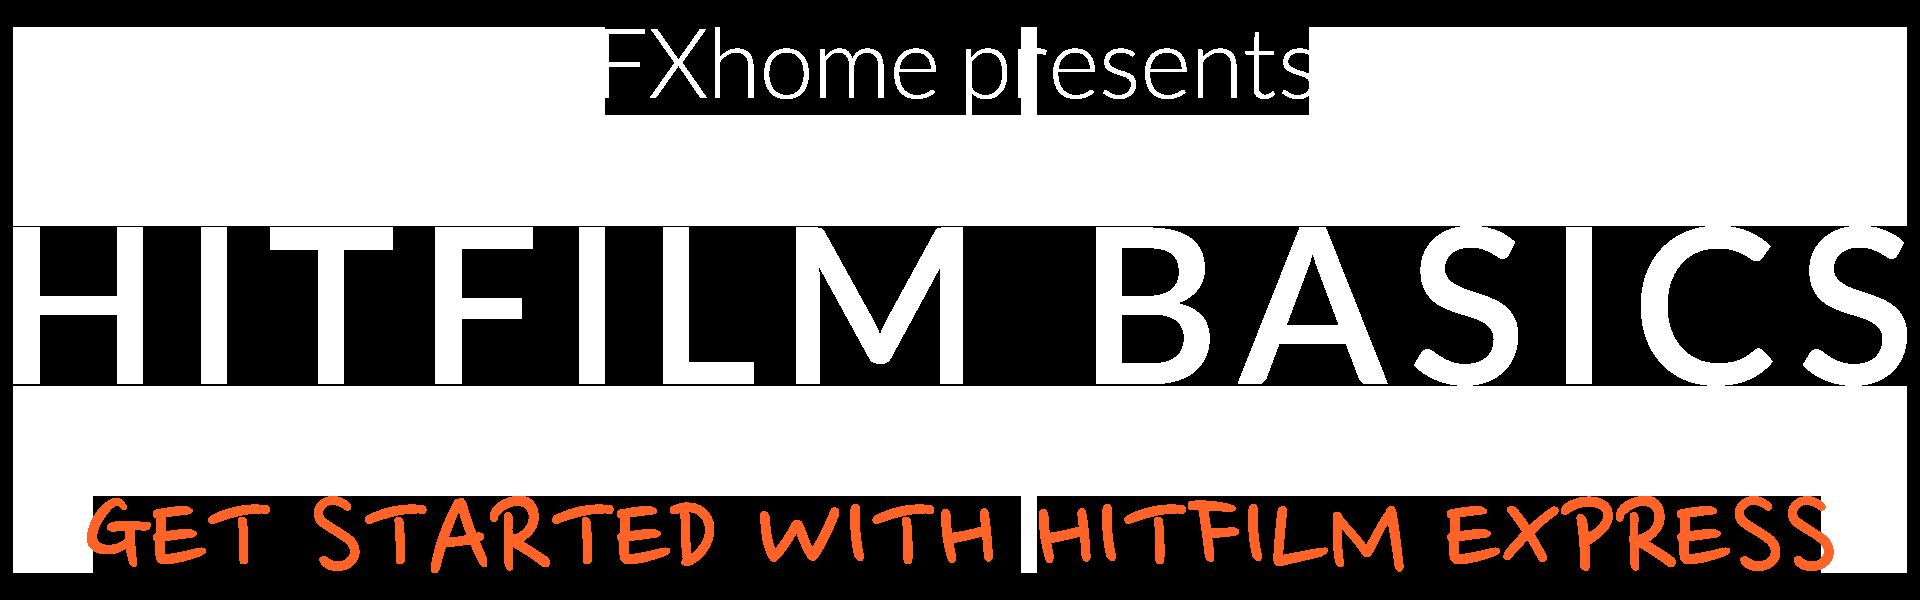 HitFilm Basics - get started with HitFilm Express